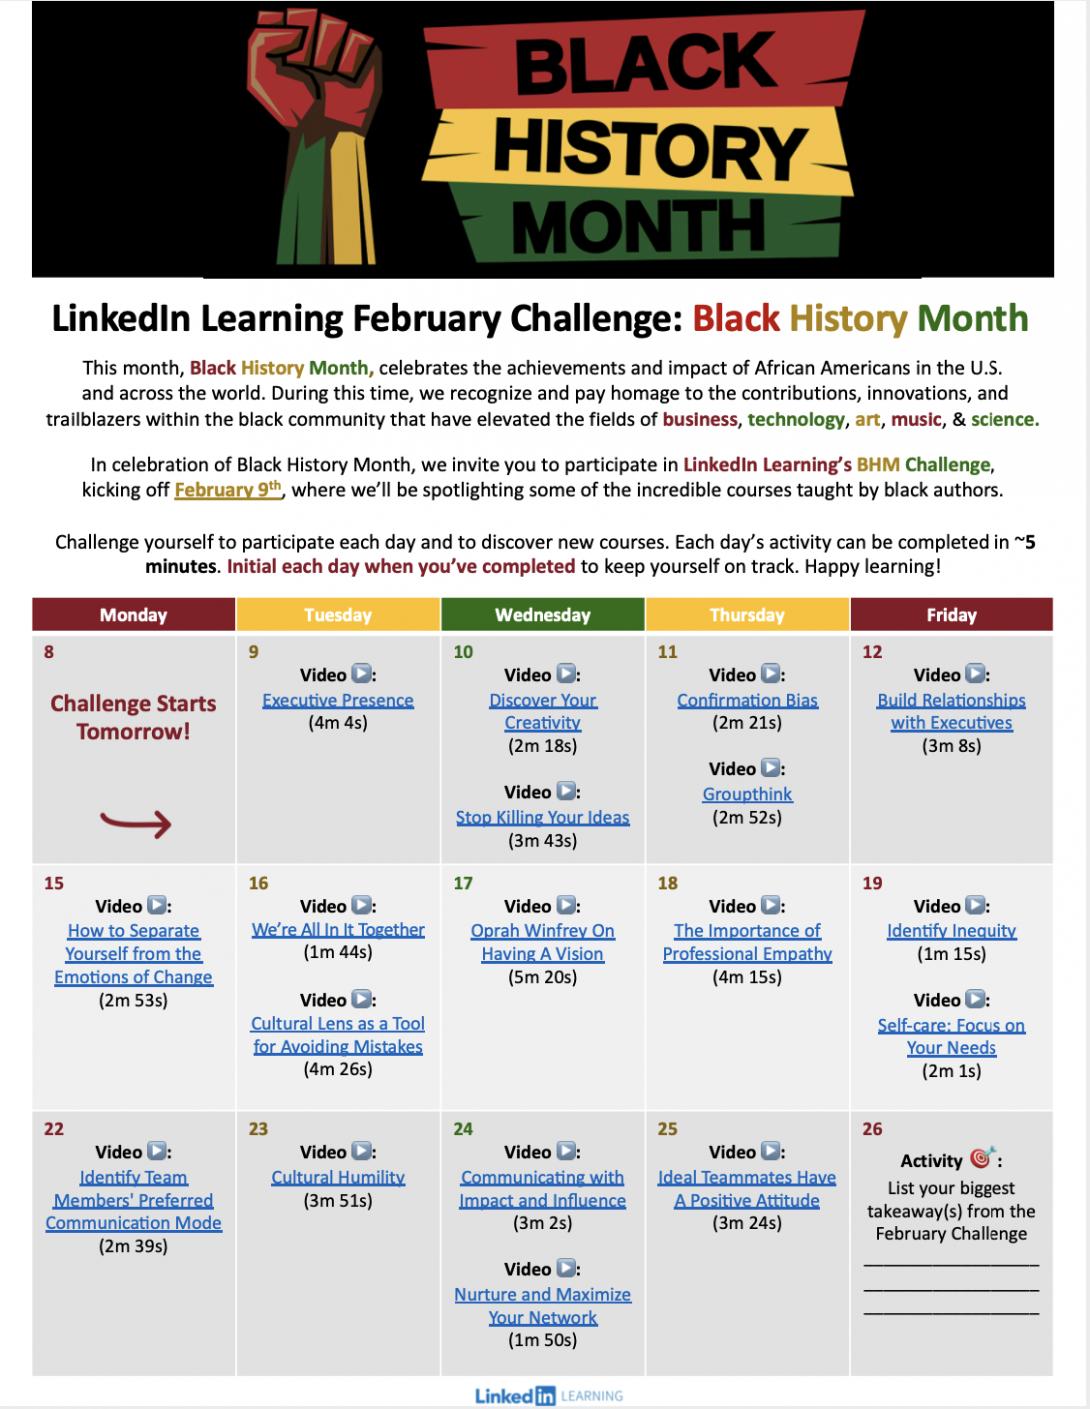 LinkedIn Learning February Challenge